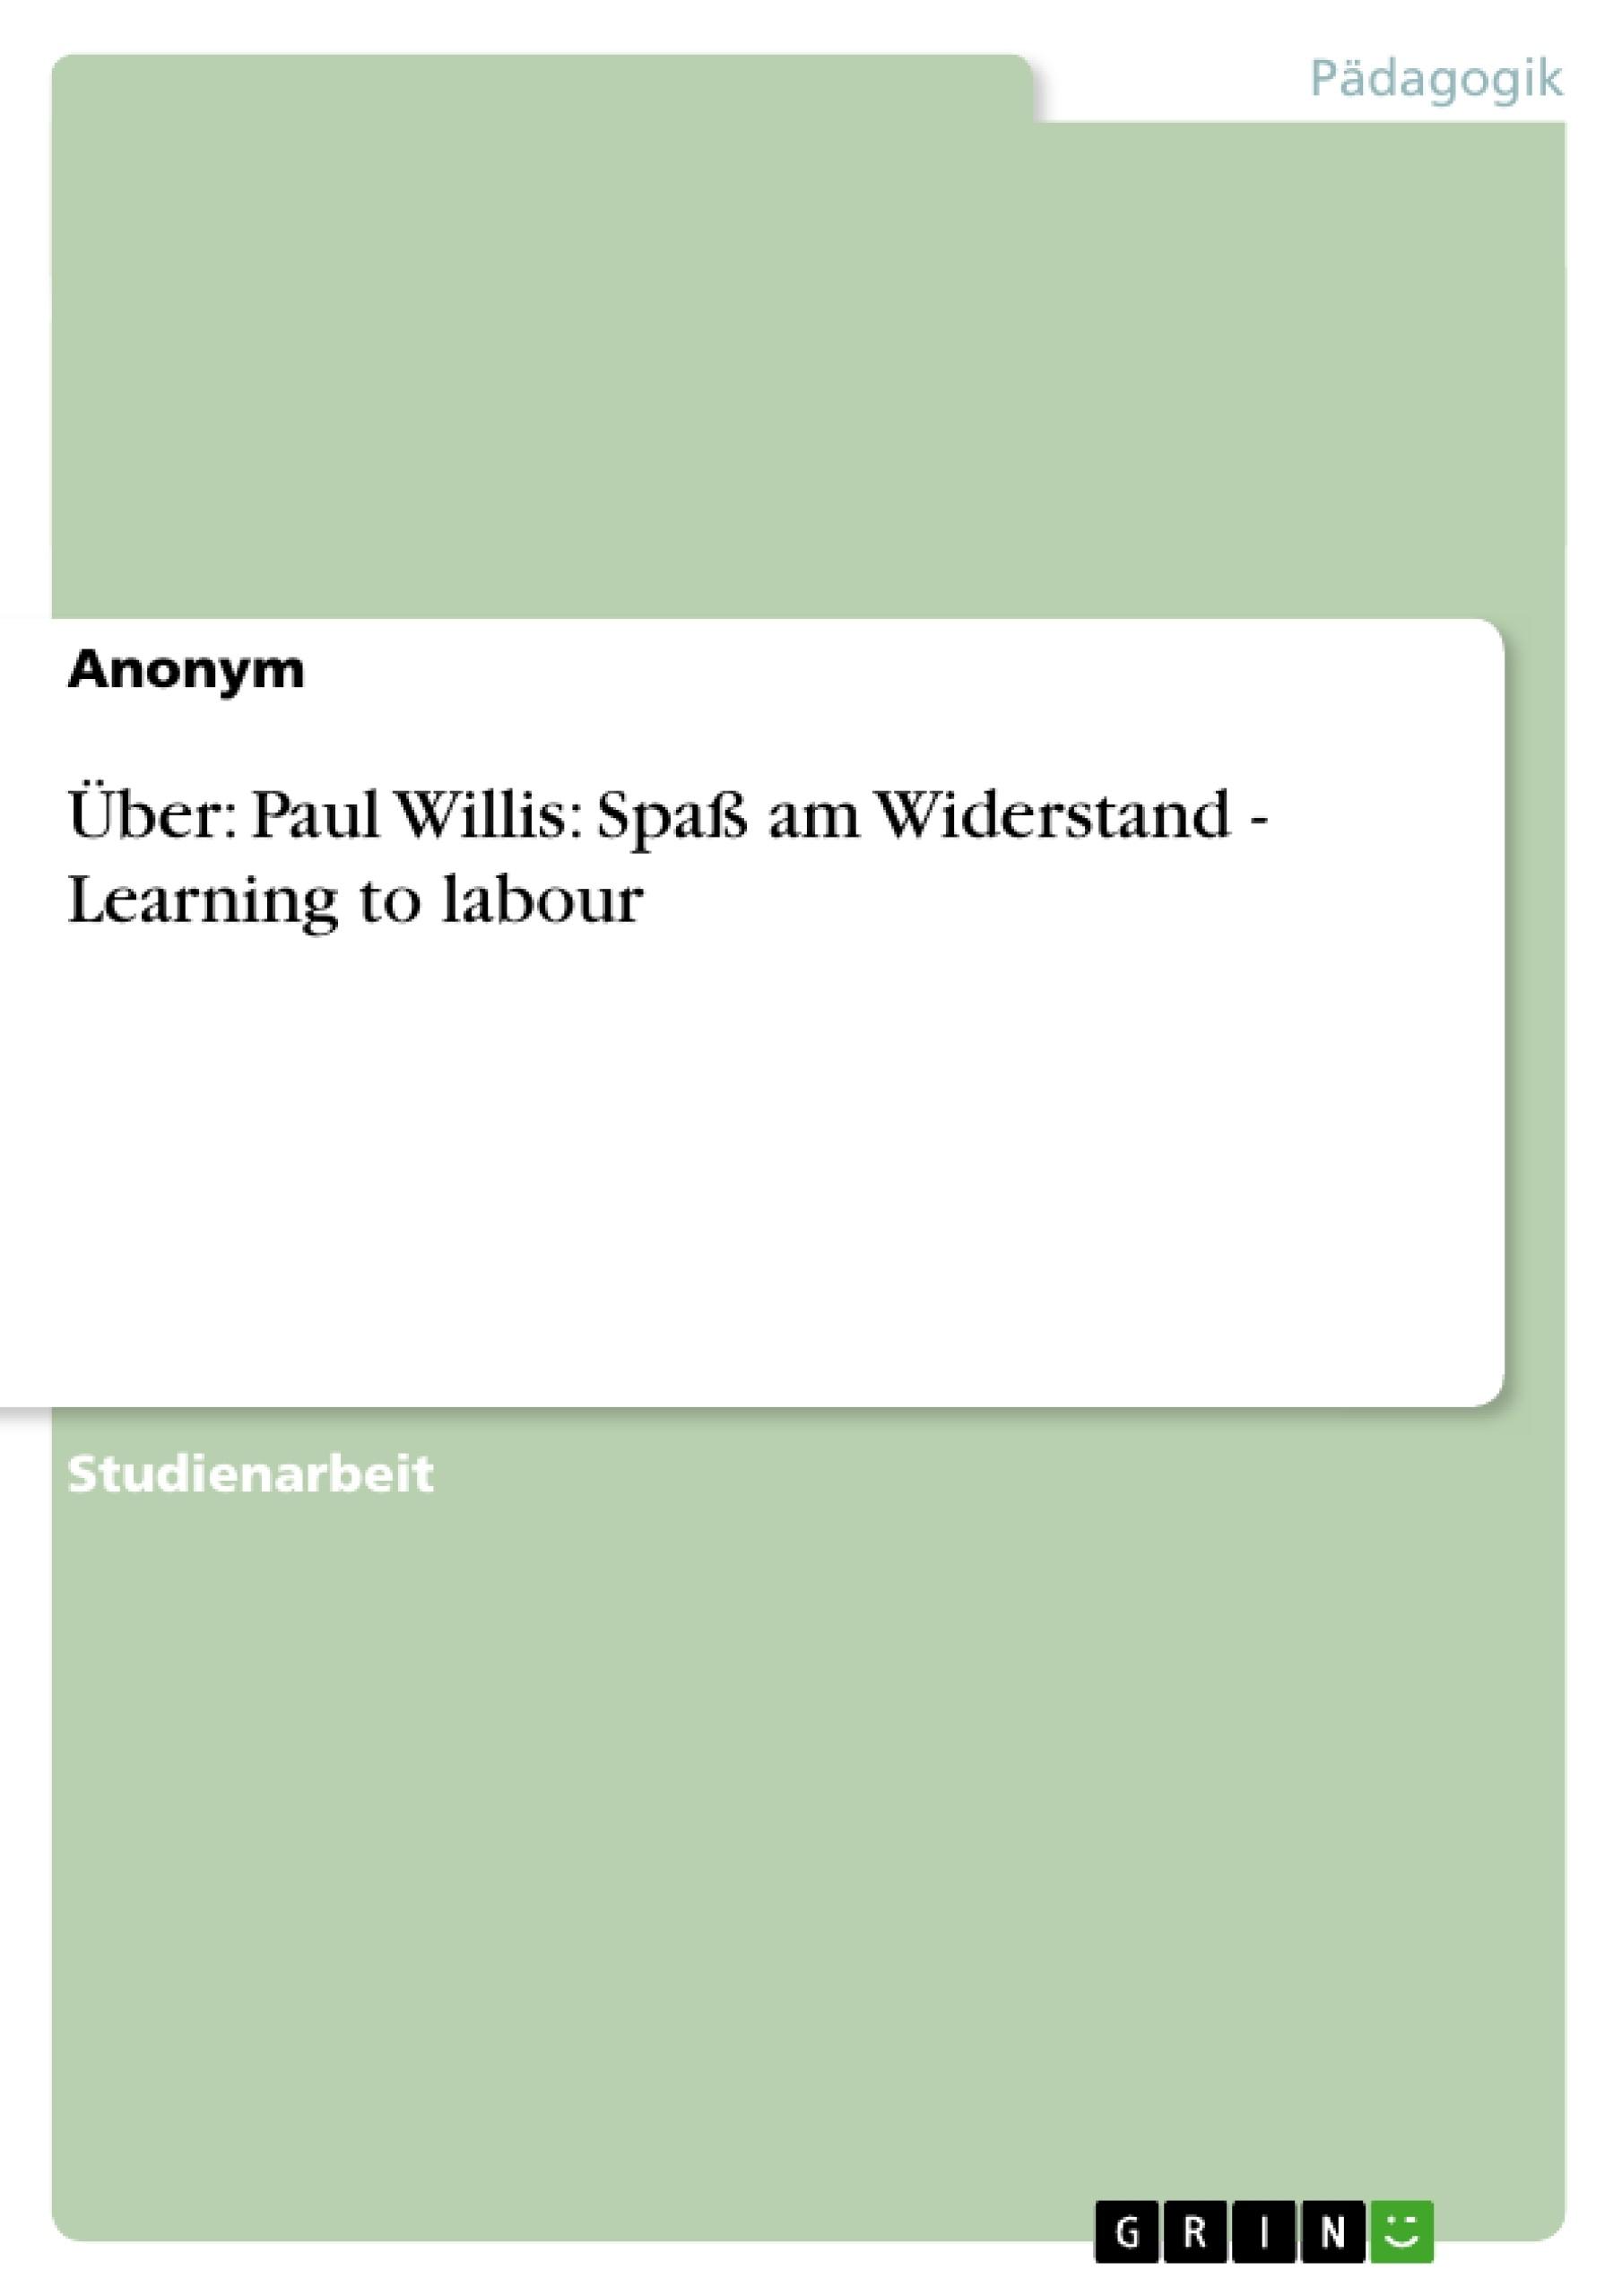 Titel: Über: Paul Willis: Spaß am Widerstand - Learning to labour